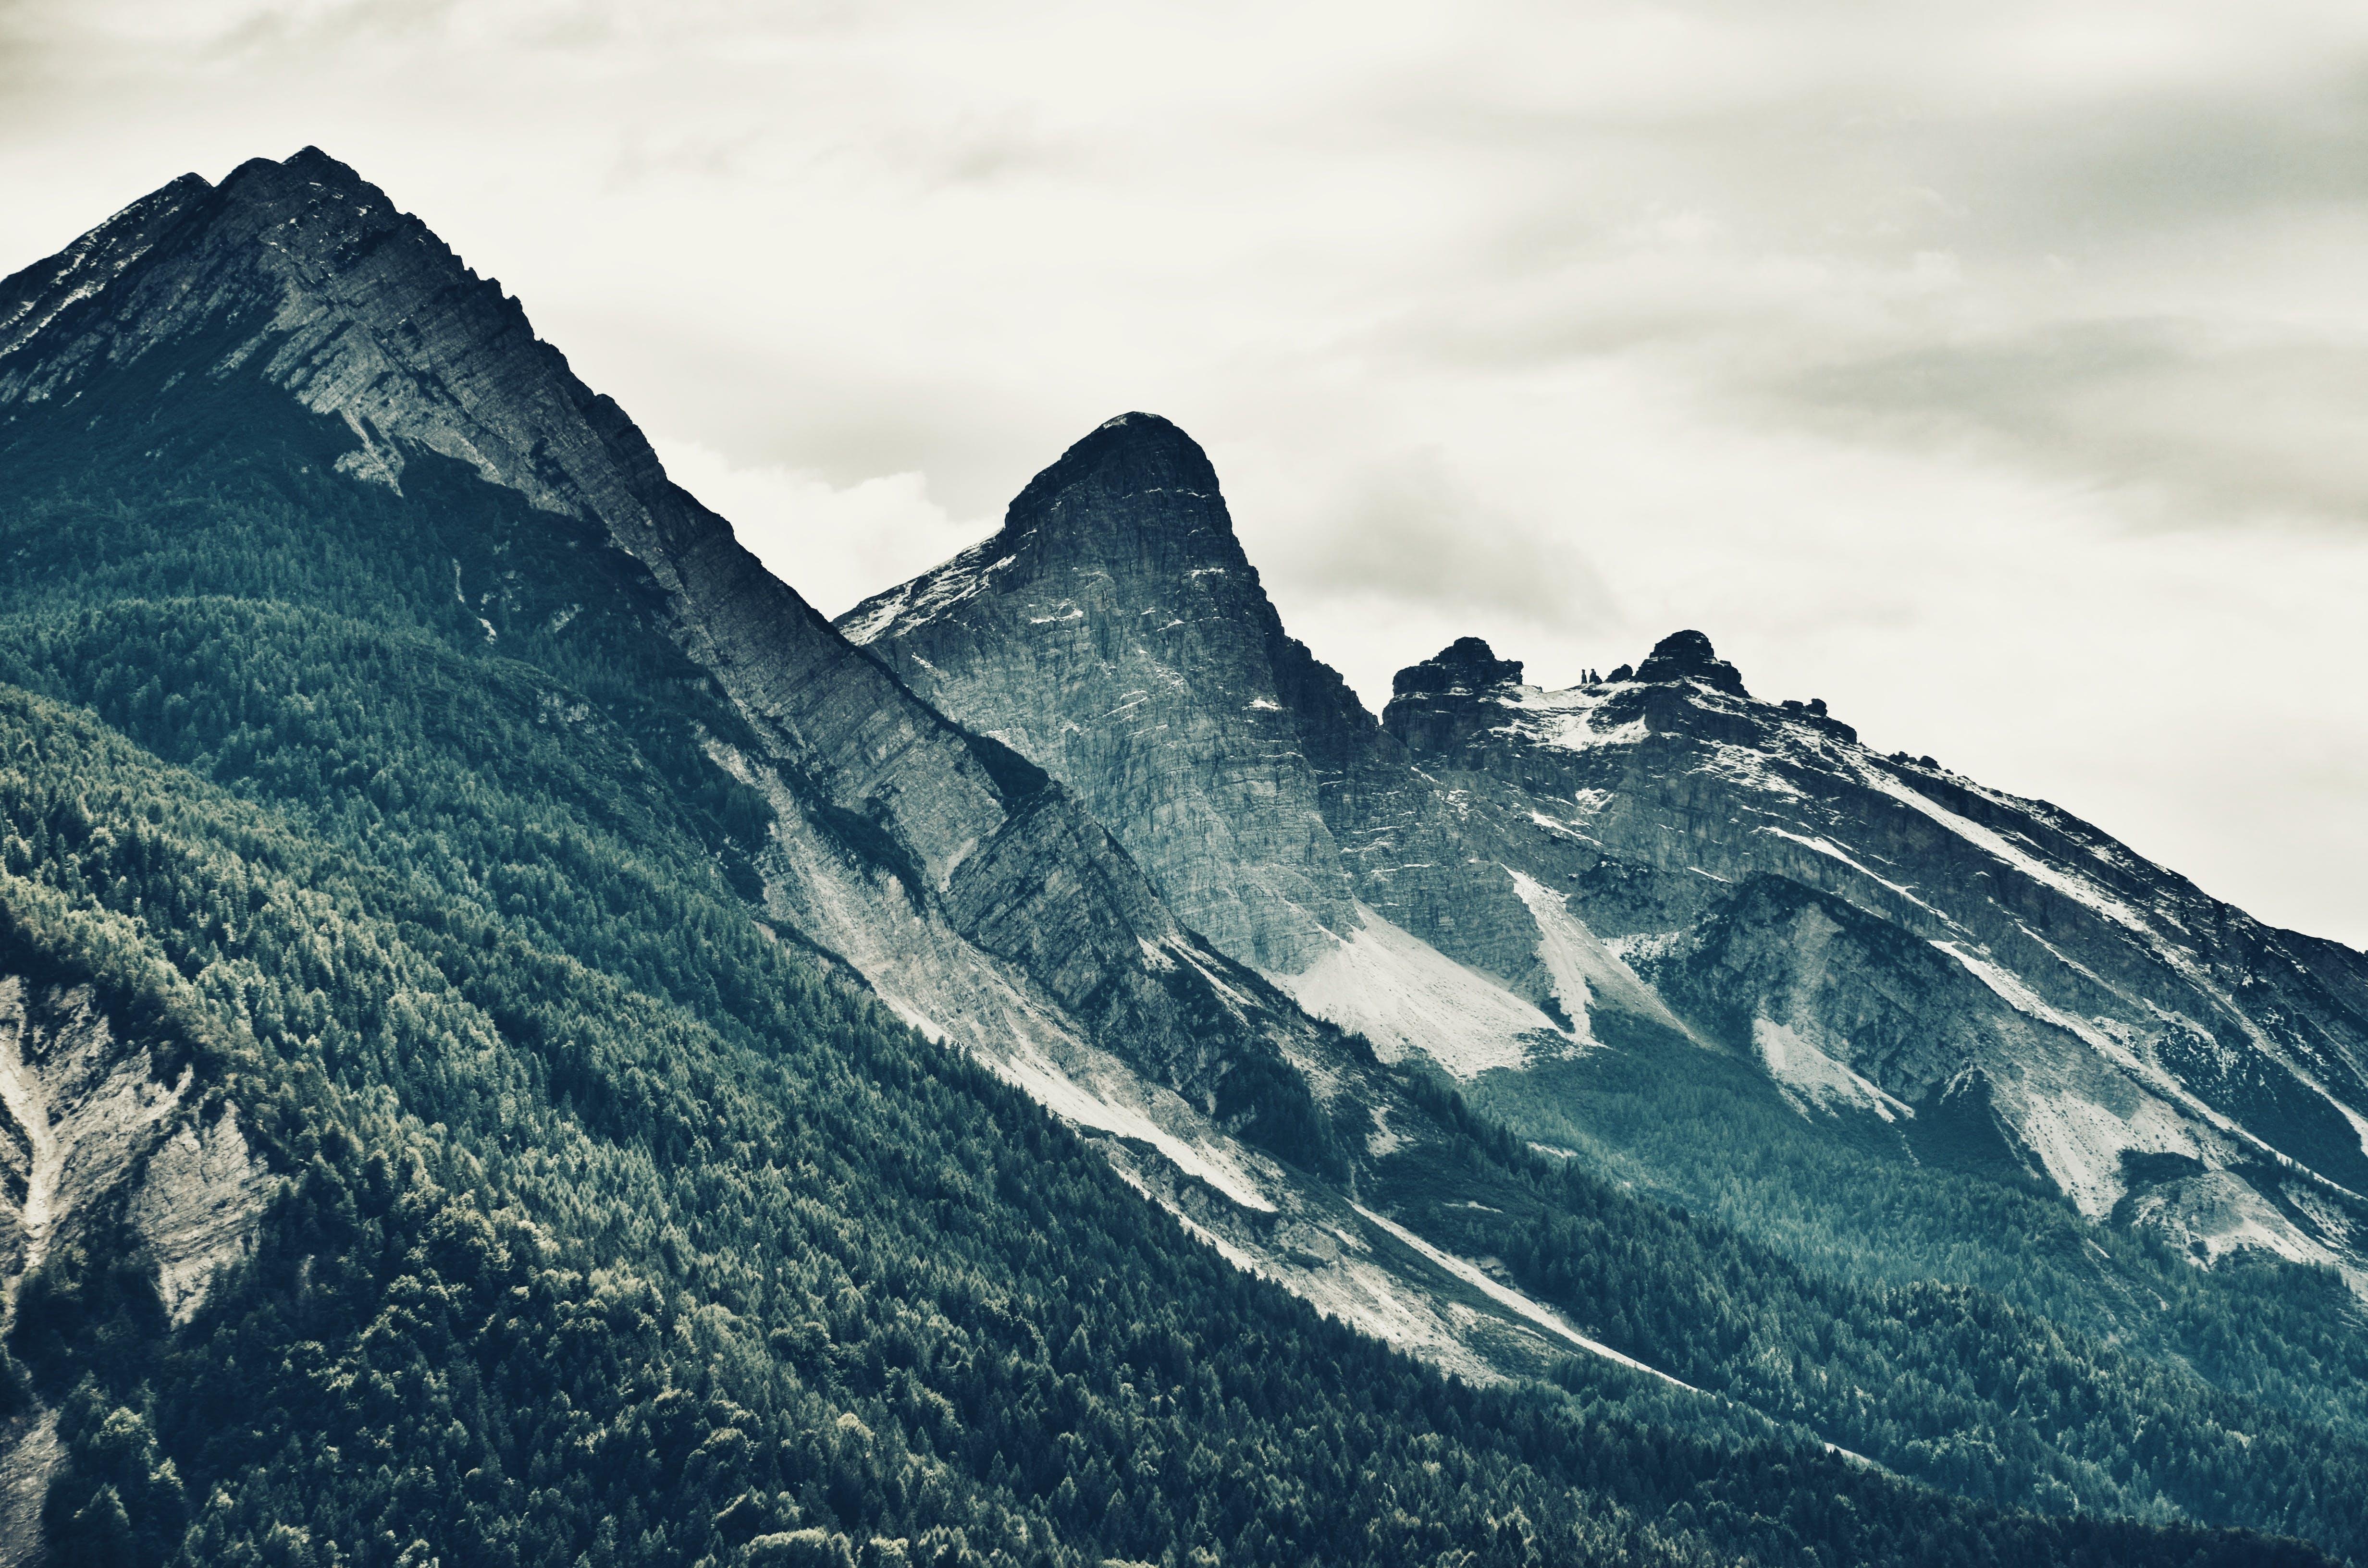 Kostenloses Stock Foto zu berg, draußen, felsiger berg, landschaft